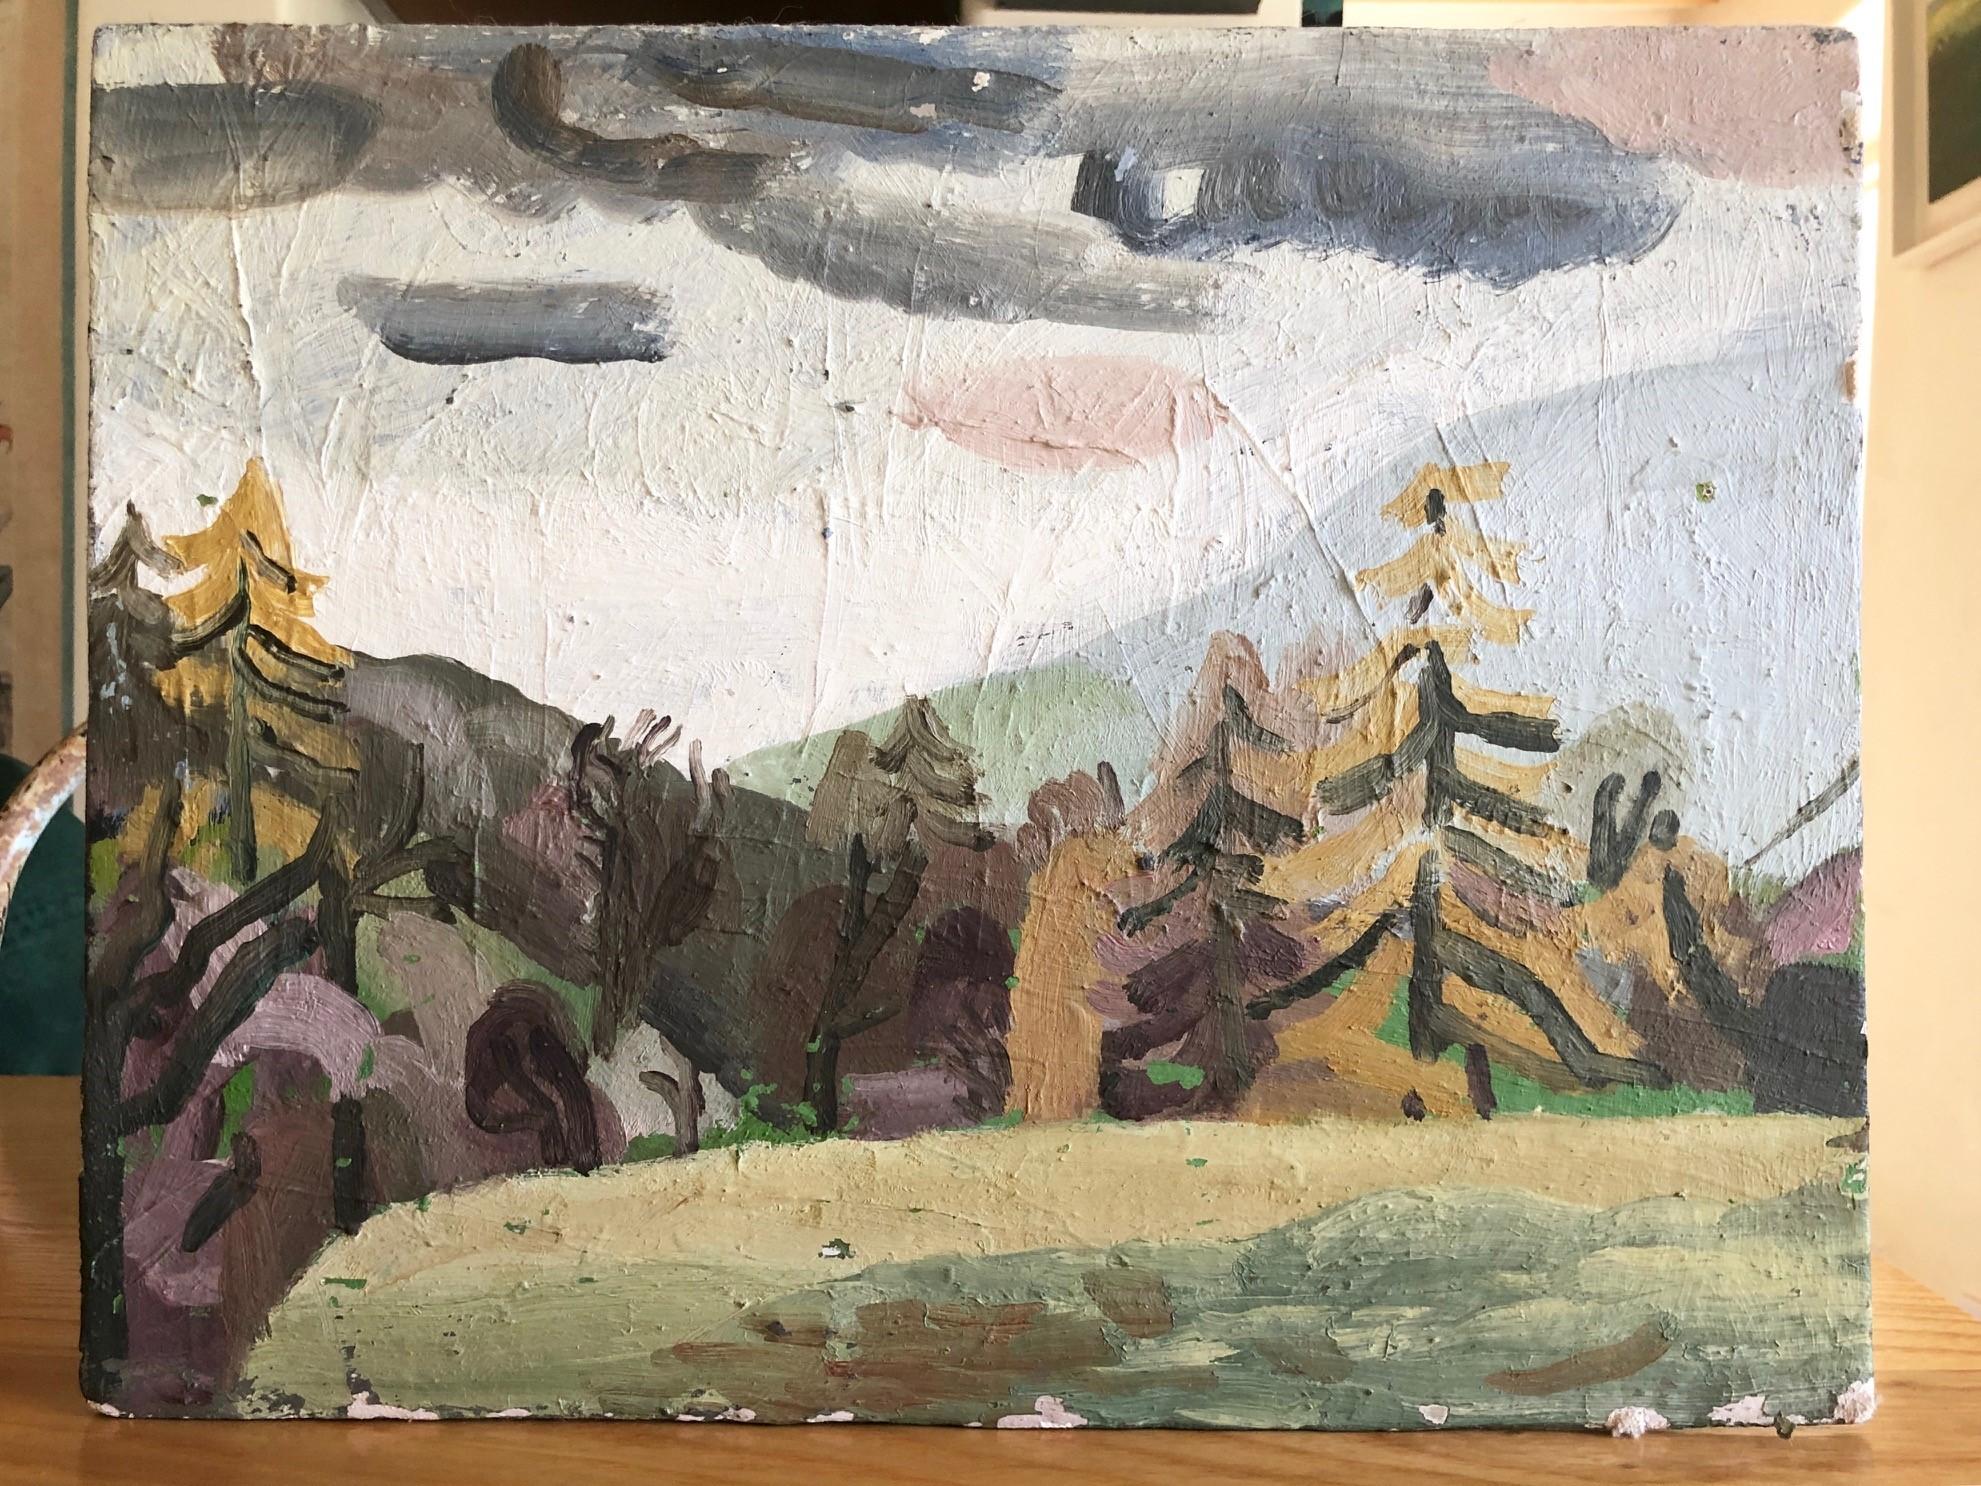 Lot 045 - Henry John (Ruskin School of Art, great grandson of Augustus John), oil on board, 'Olchon Valley',